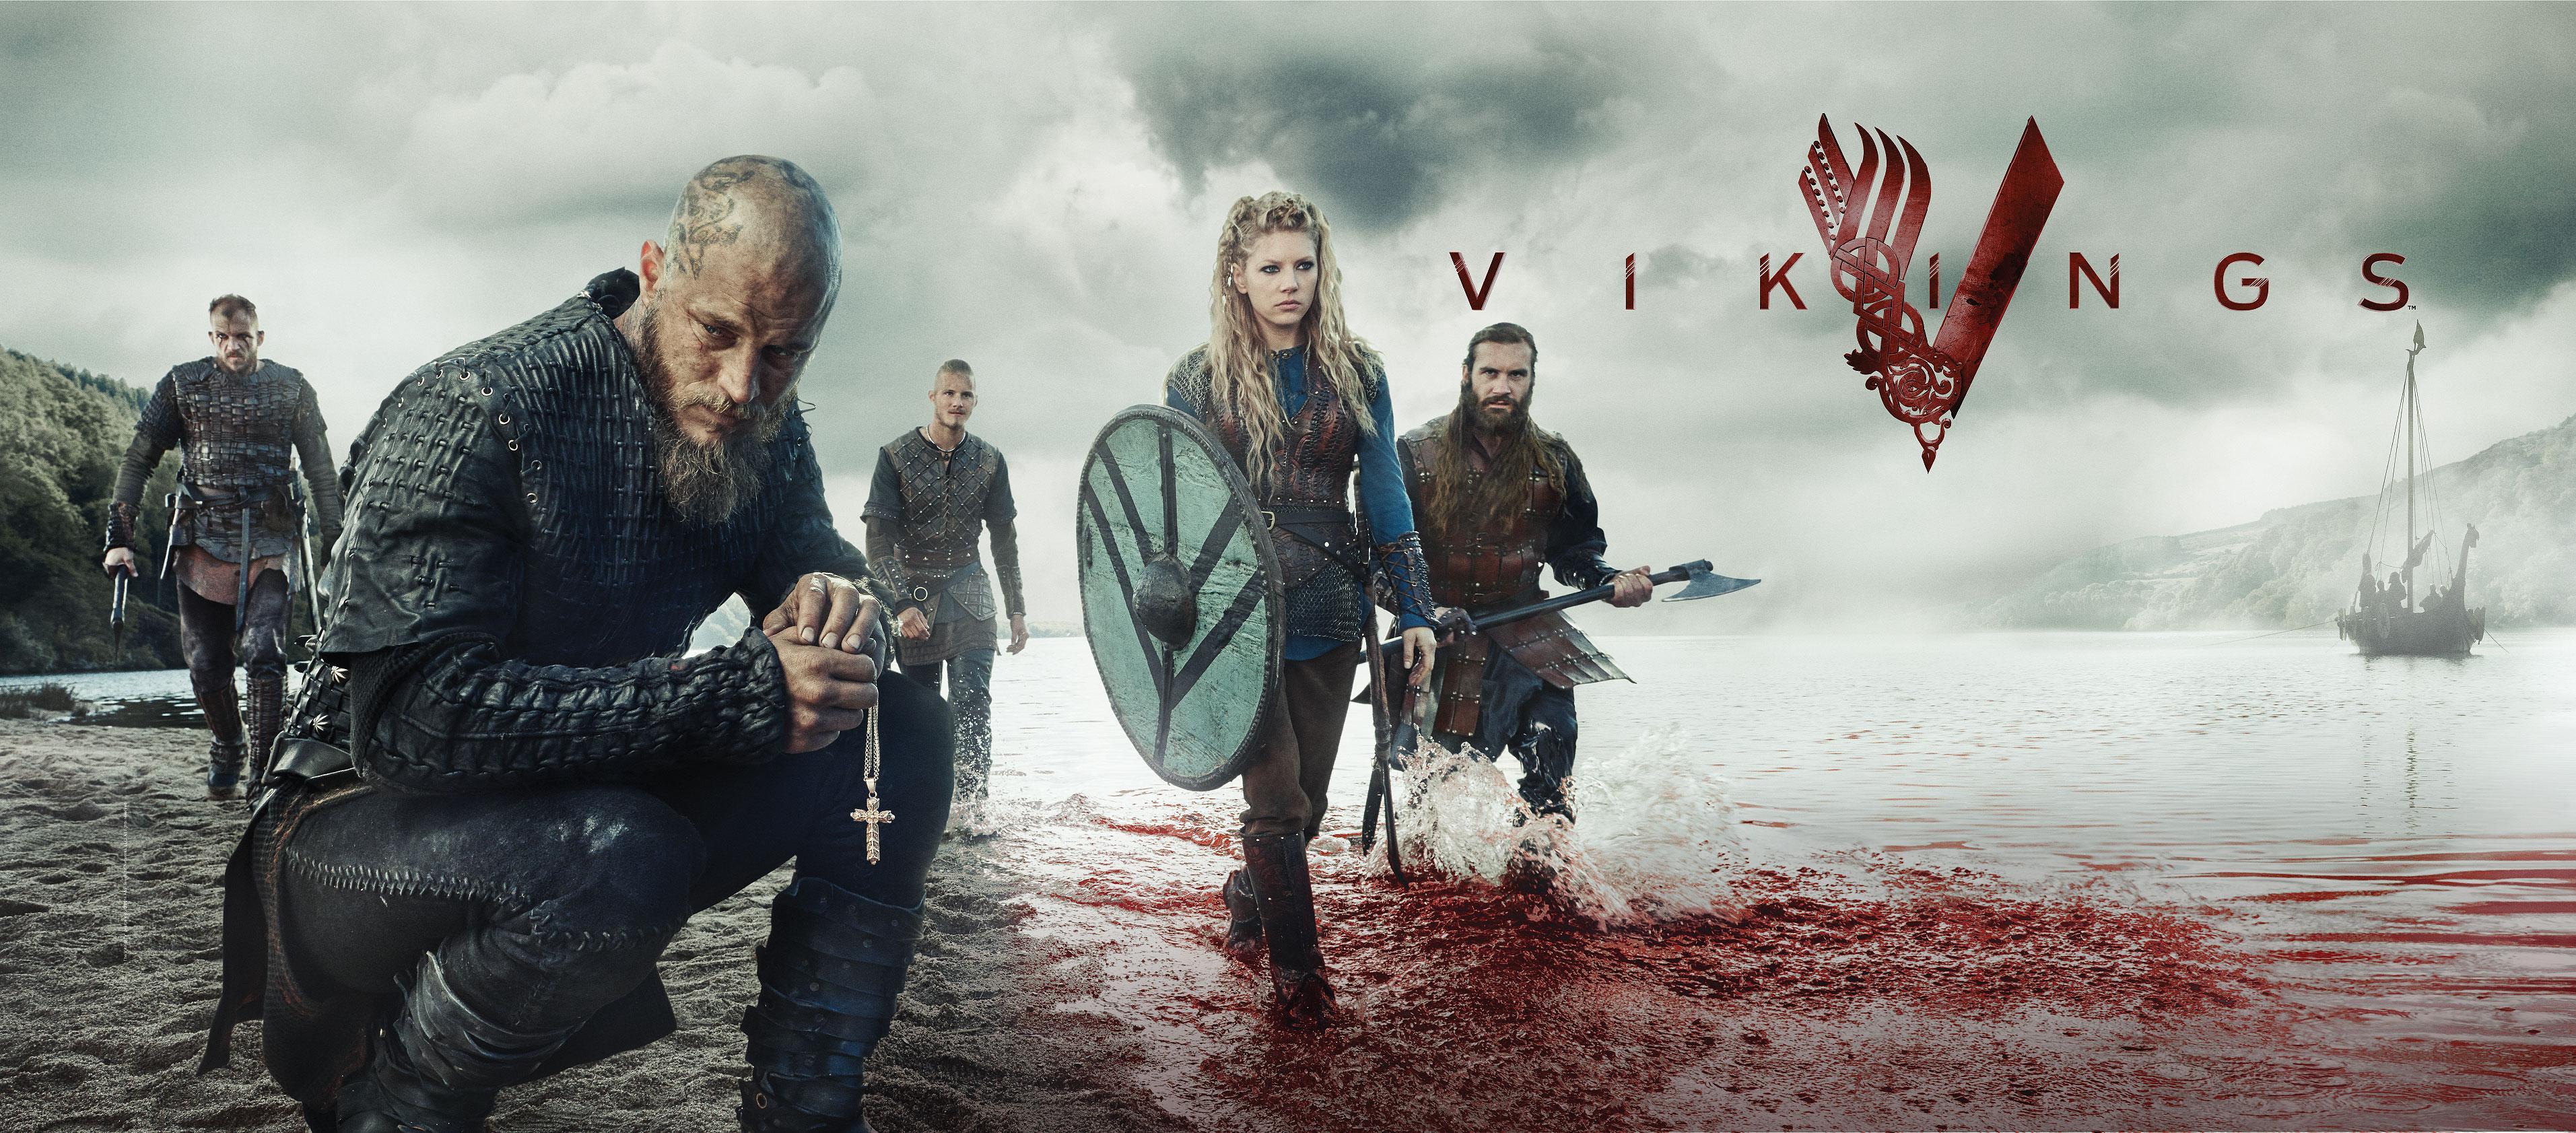 Vikings Wallpapers Top Free Vikings Backgrounds Wallpaperaccess